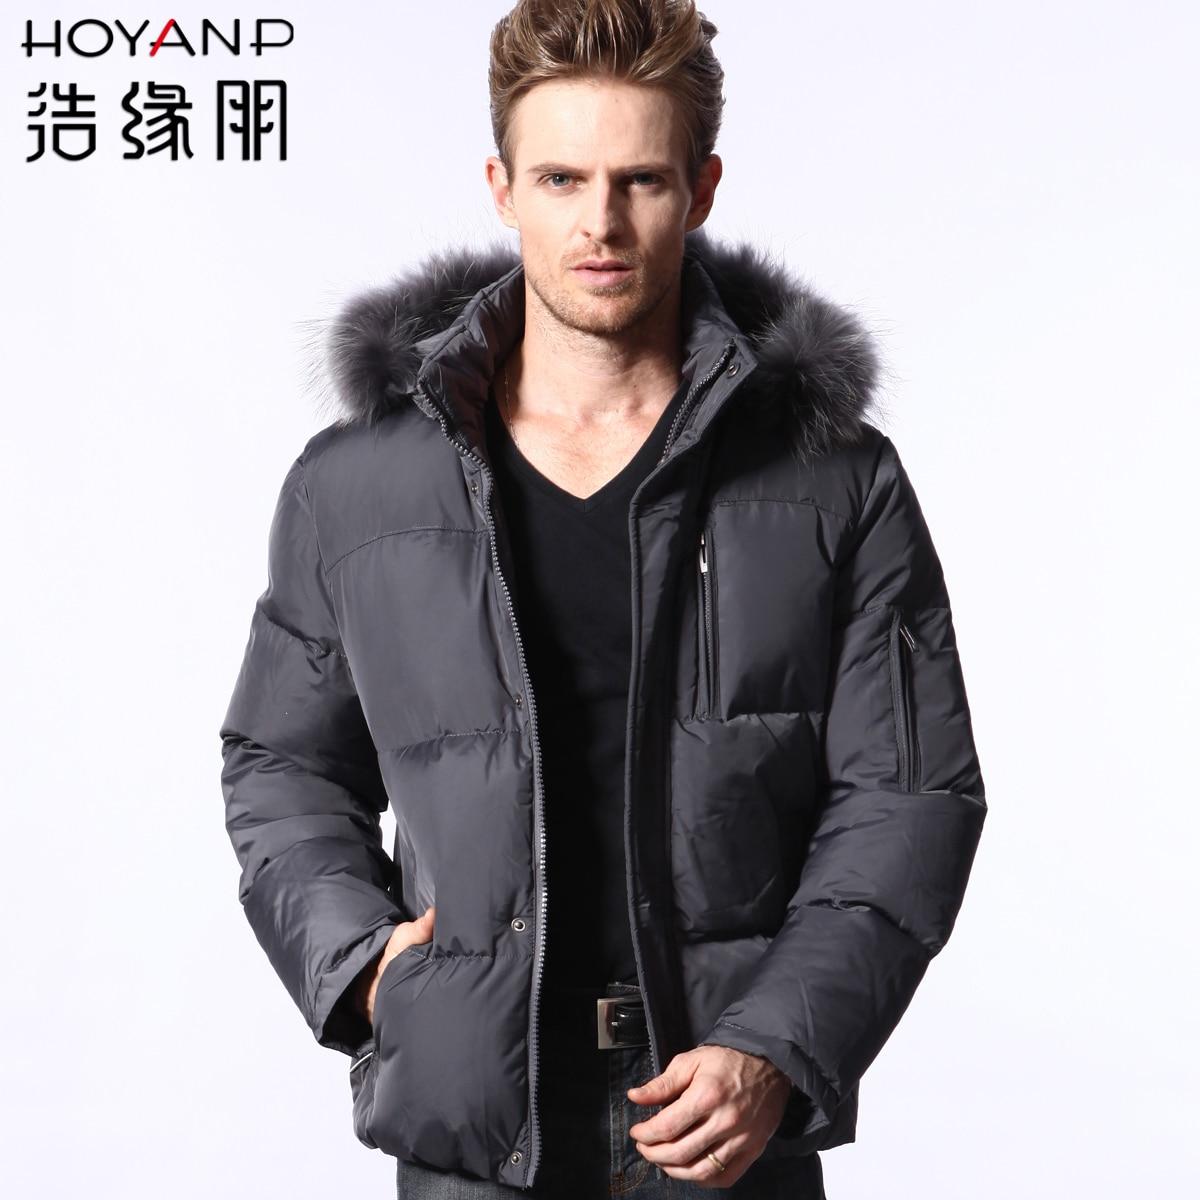 Aliexpress.com : Buy NEW 2013 HOYANP Winter Down Coat Male Short